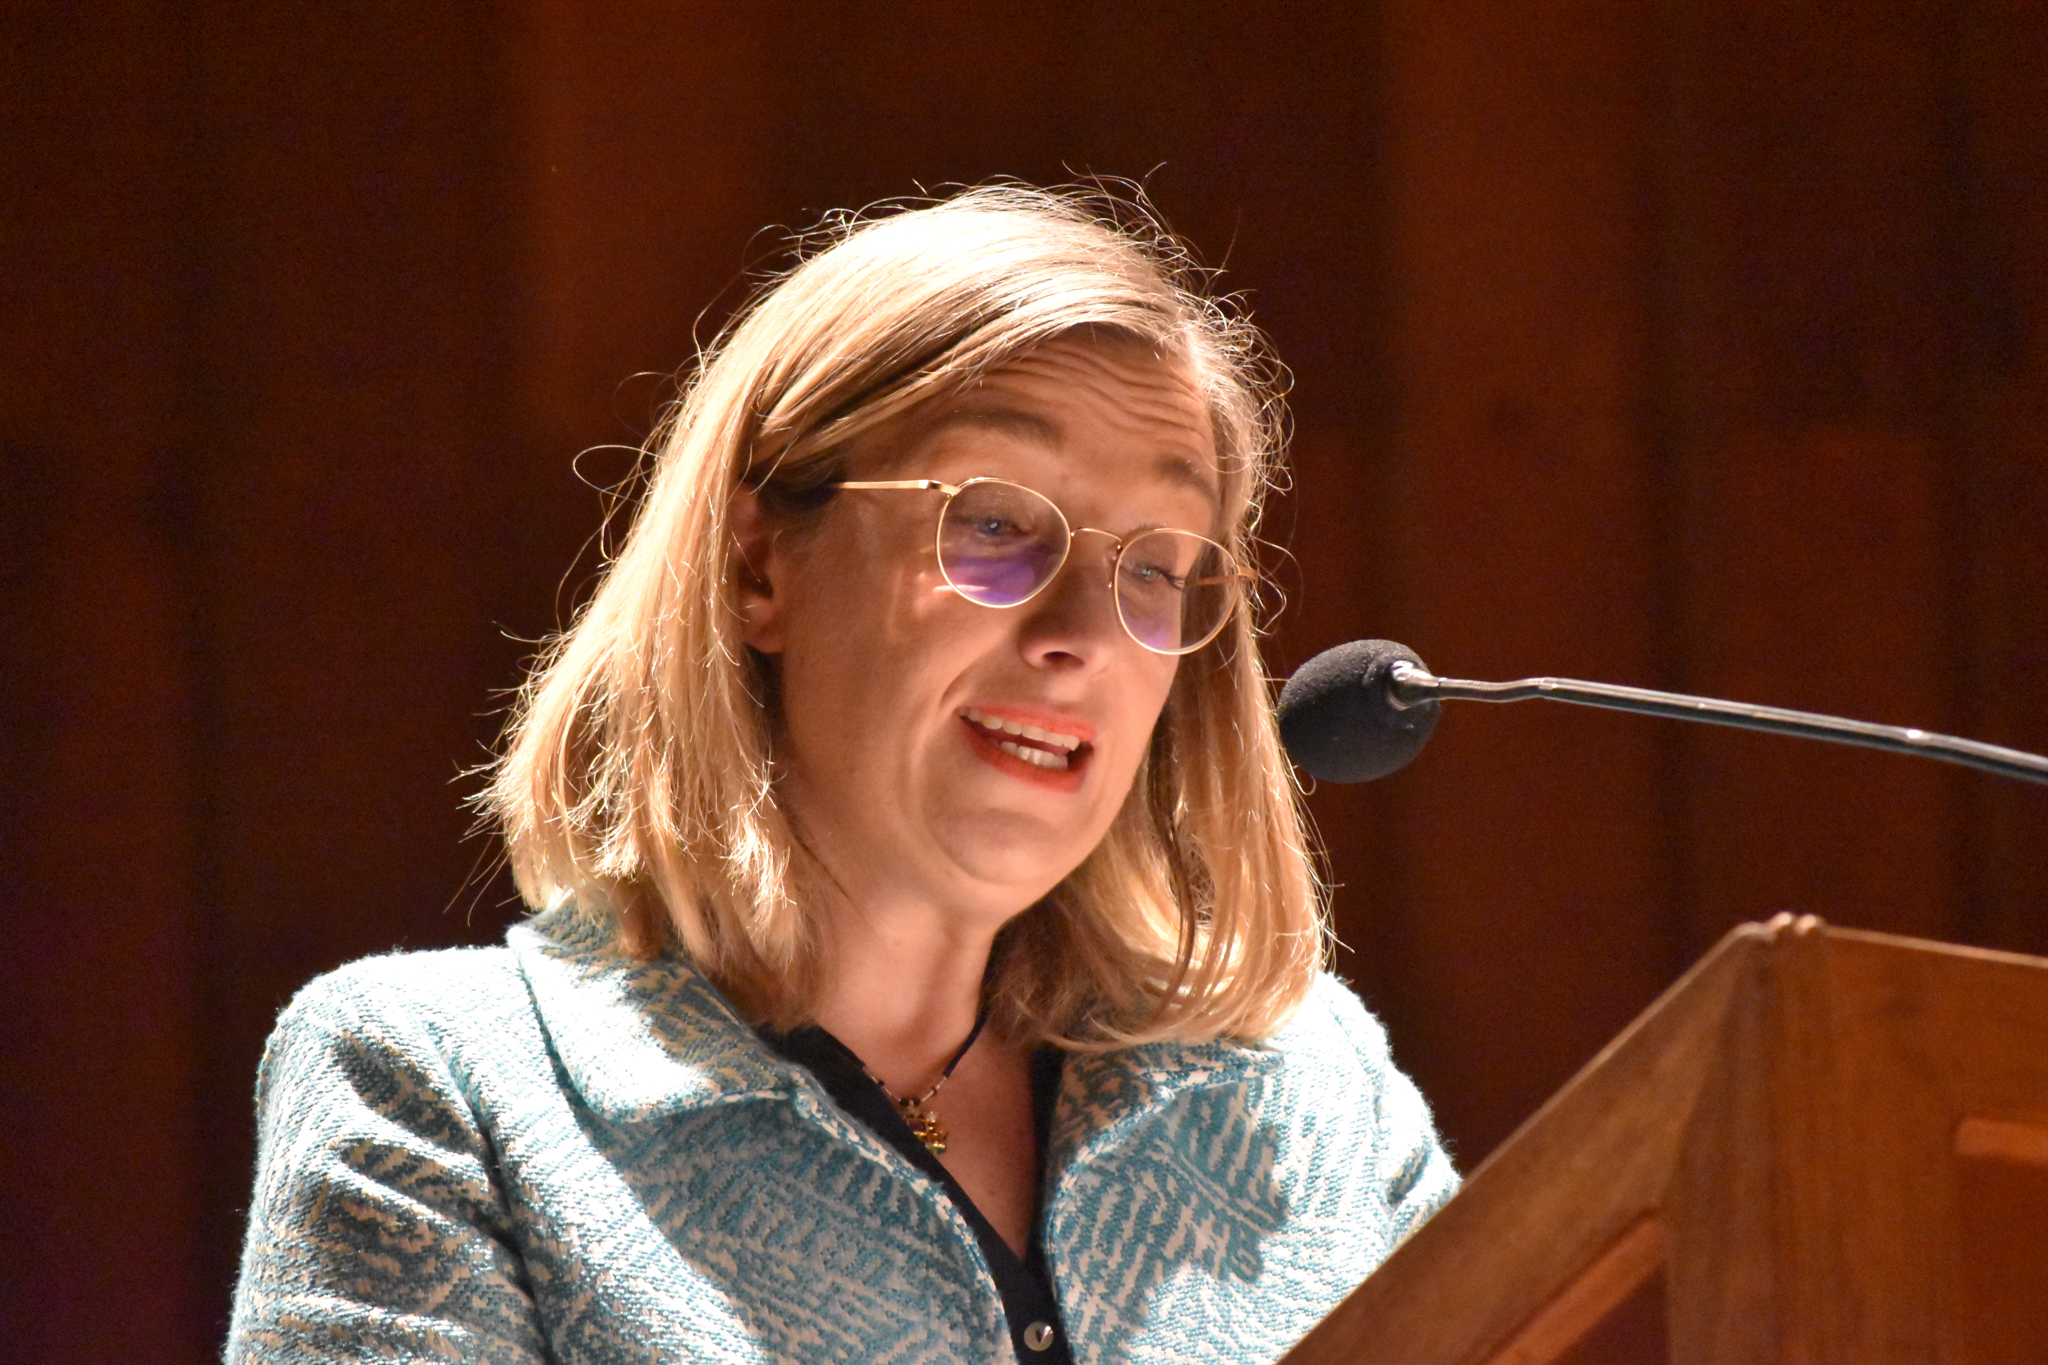 Kristina Birke Daniels, directora de la Friedrich-Ebert-Stiftung en Colombia (Foto: Aura Flechas)